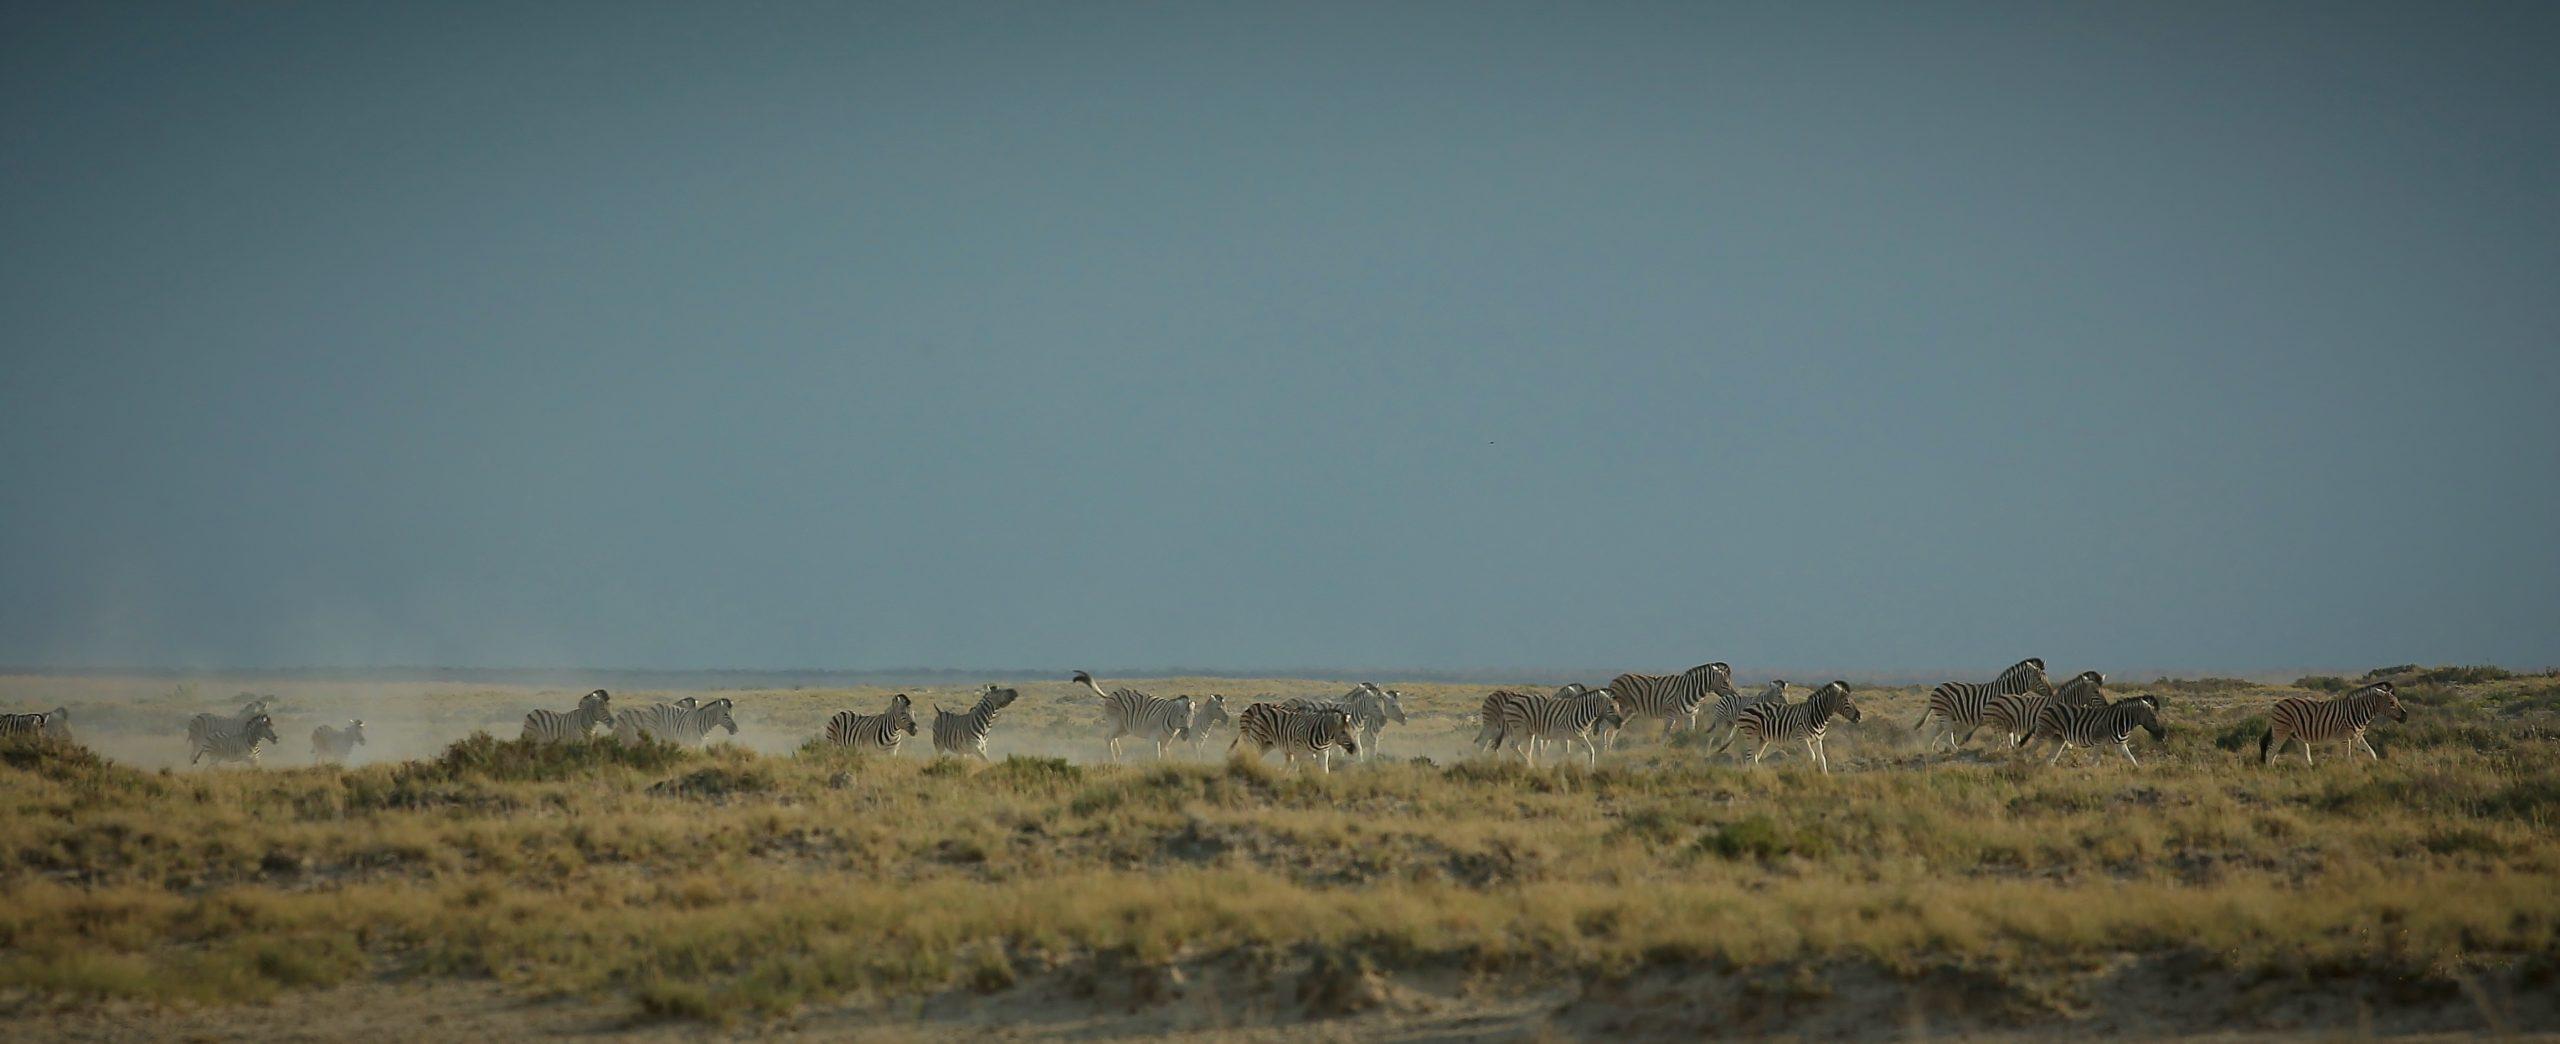 Zbres d'Etosha, Namibie